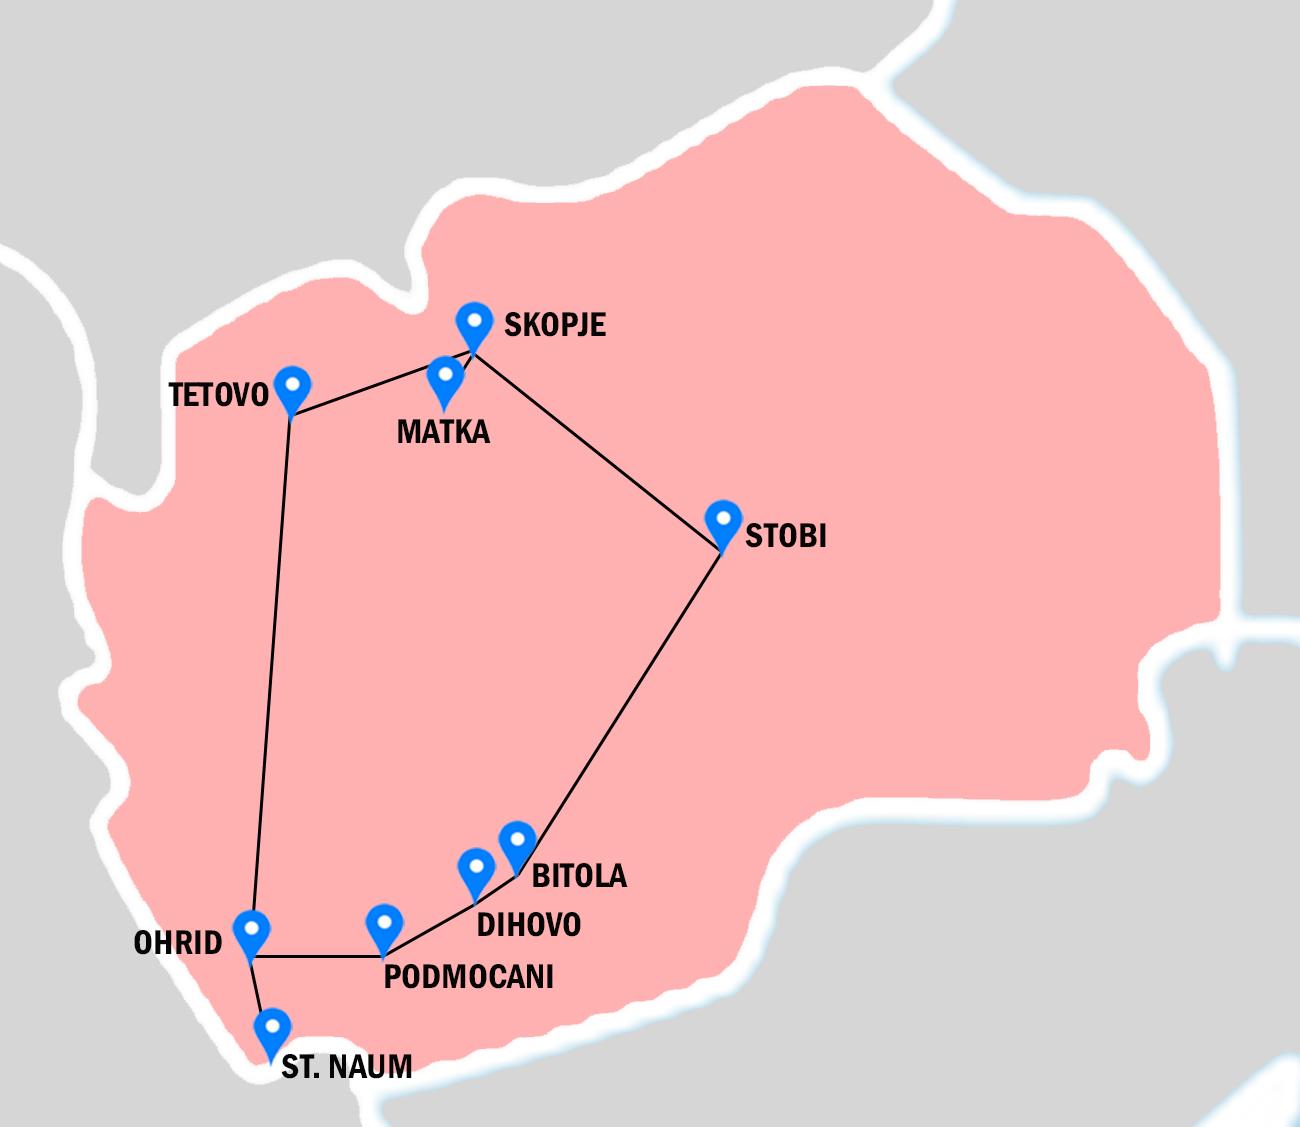 MACEDONIAN-RHAPSODY